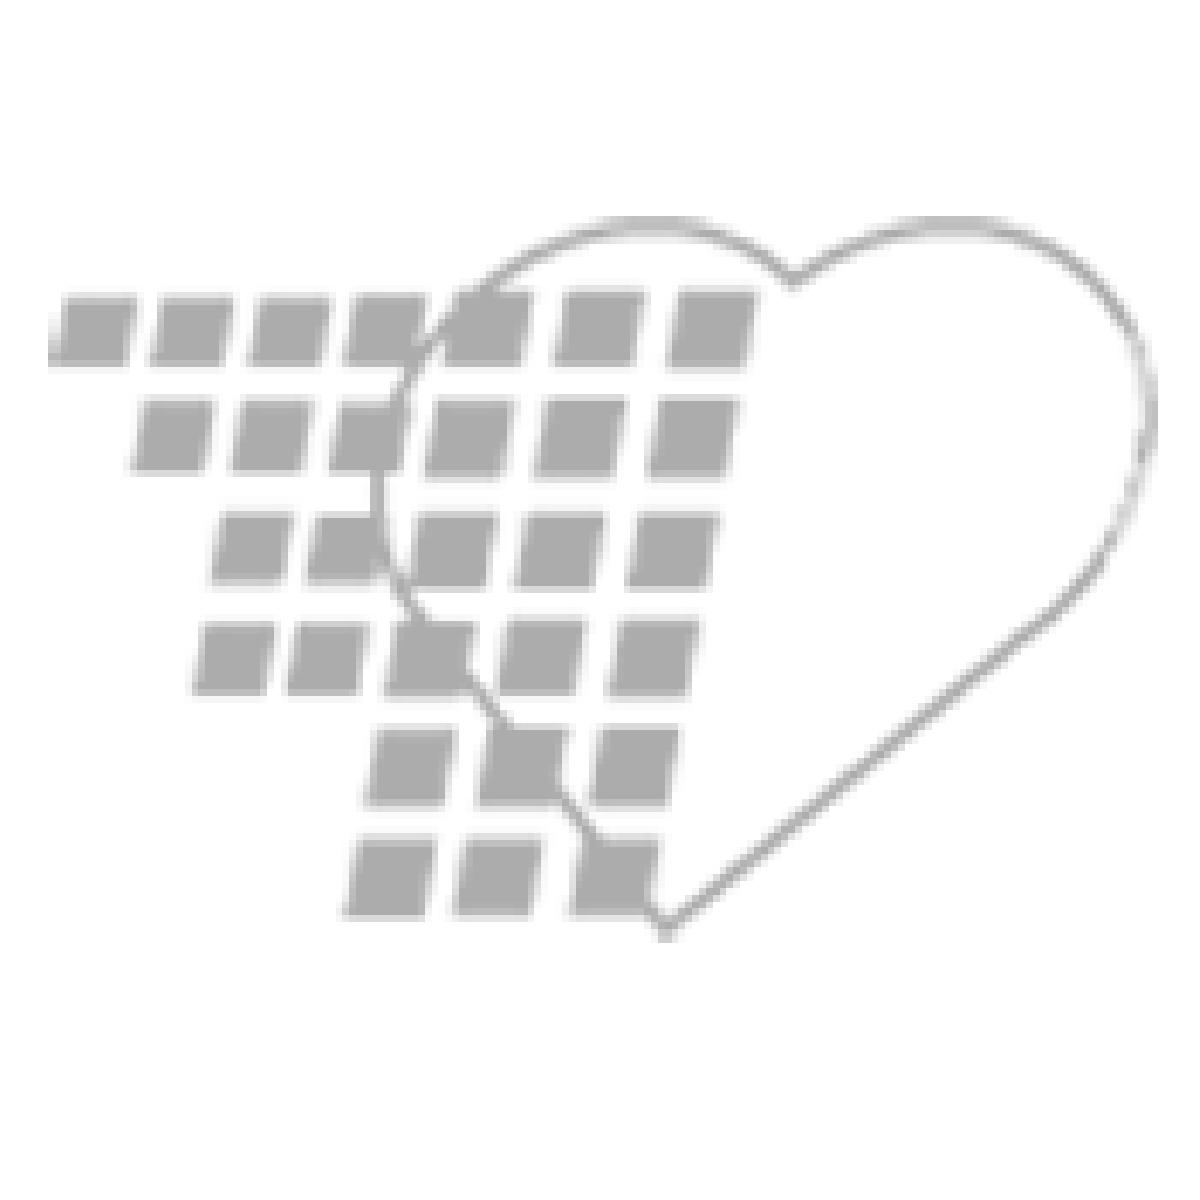 09-31-0900 - 9 Tab - Side Open Preprinted Poly Divider Set